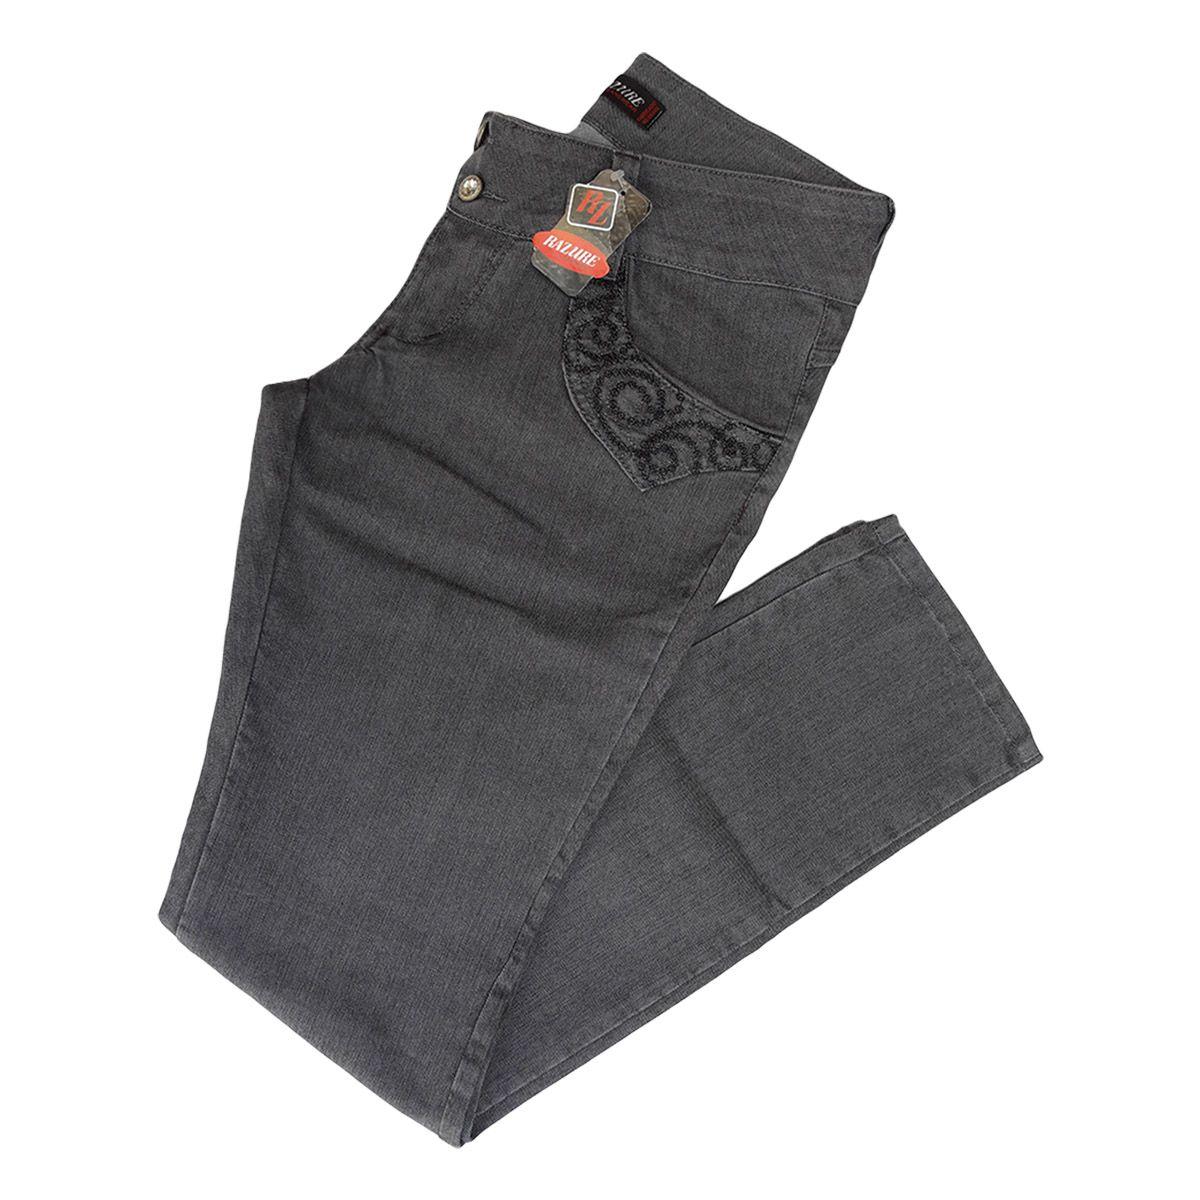 Kit C/ 02 Calças Jeans Femininas Tamanho 44